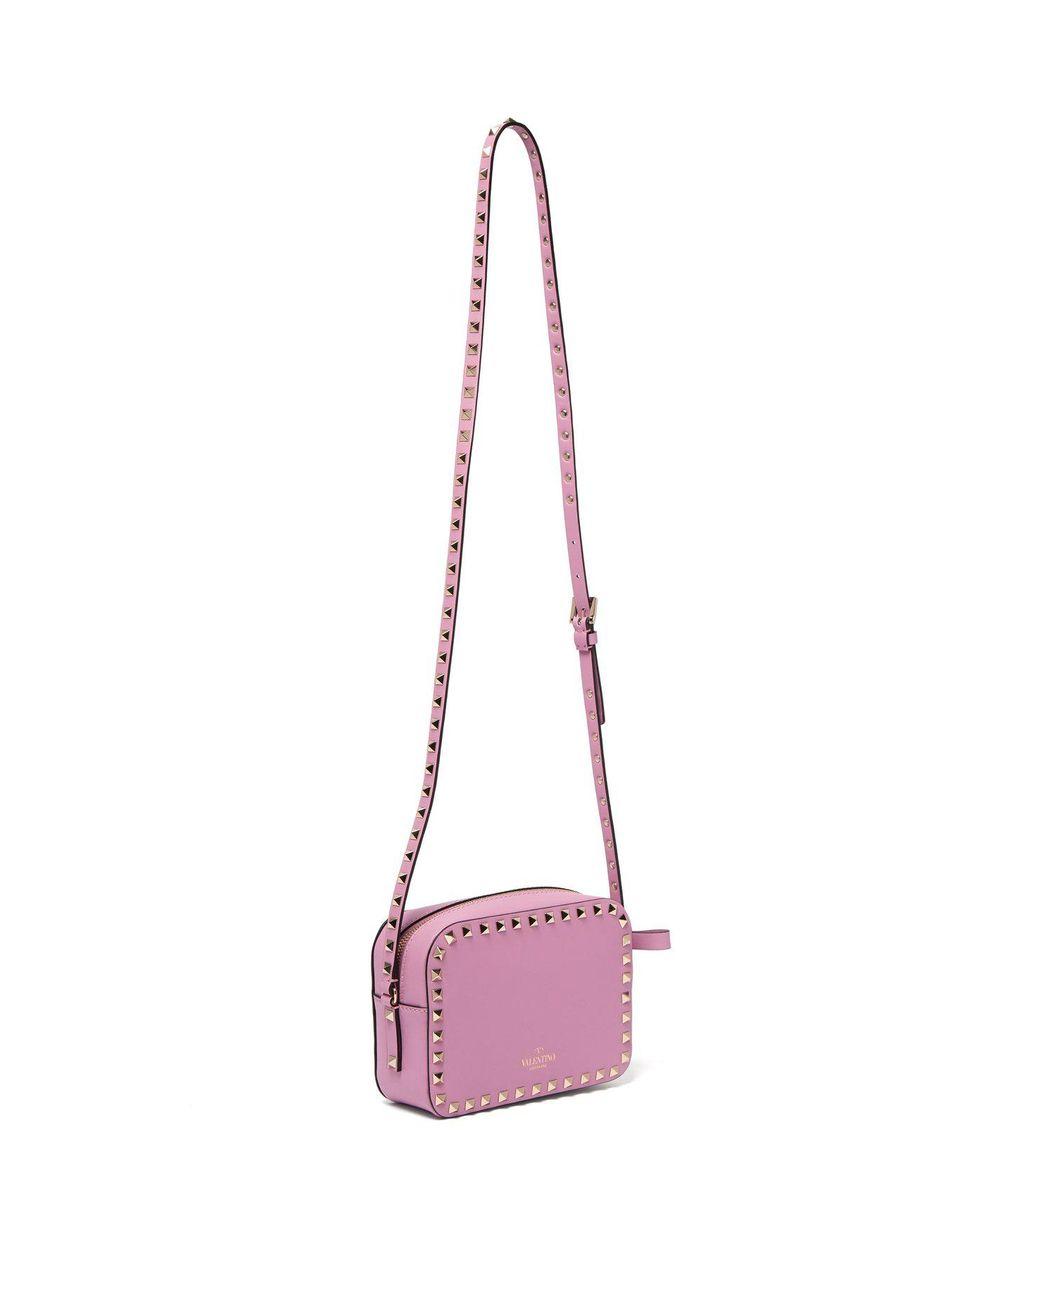 b1b52b321a Valentino Rockstud Camera Leather Cross Body Bag in Pink - Lyst